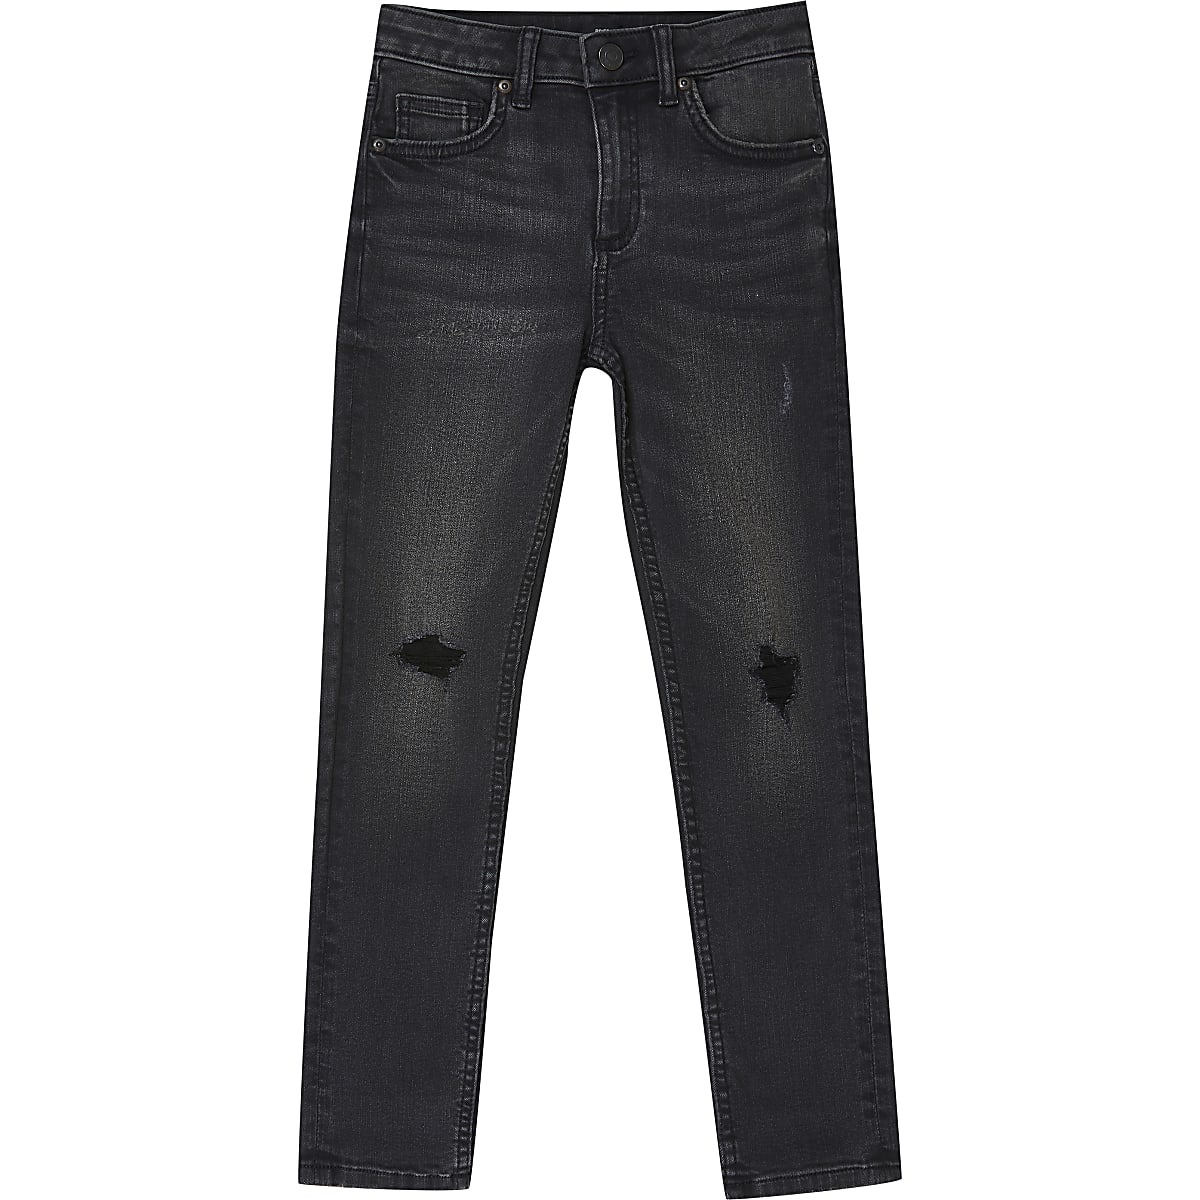 Sid - Zwarte wash ripped skinny jeans voor jongens